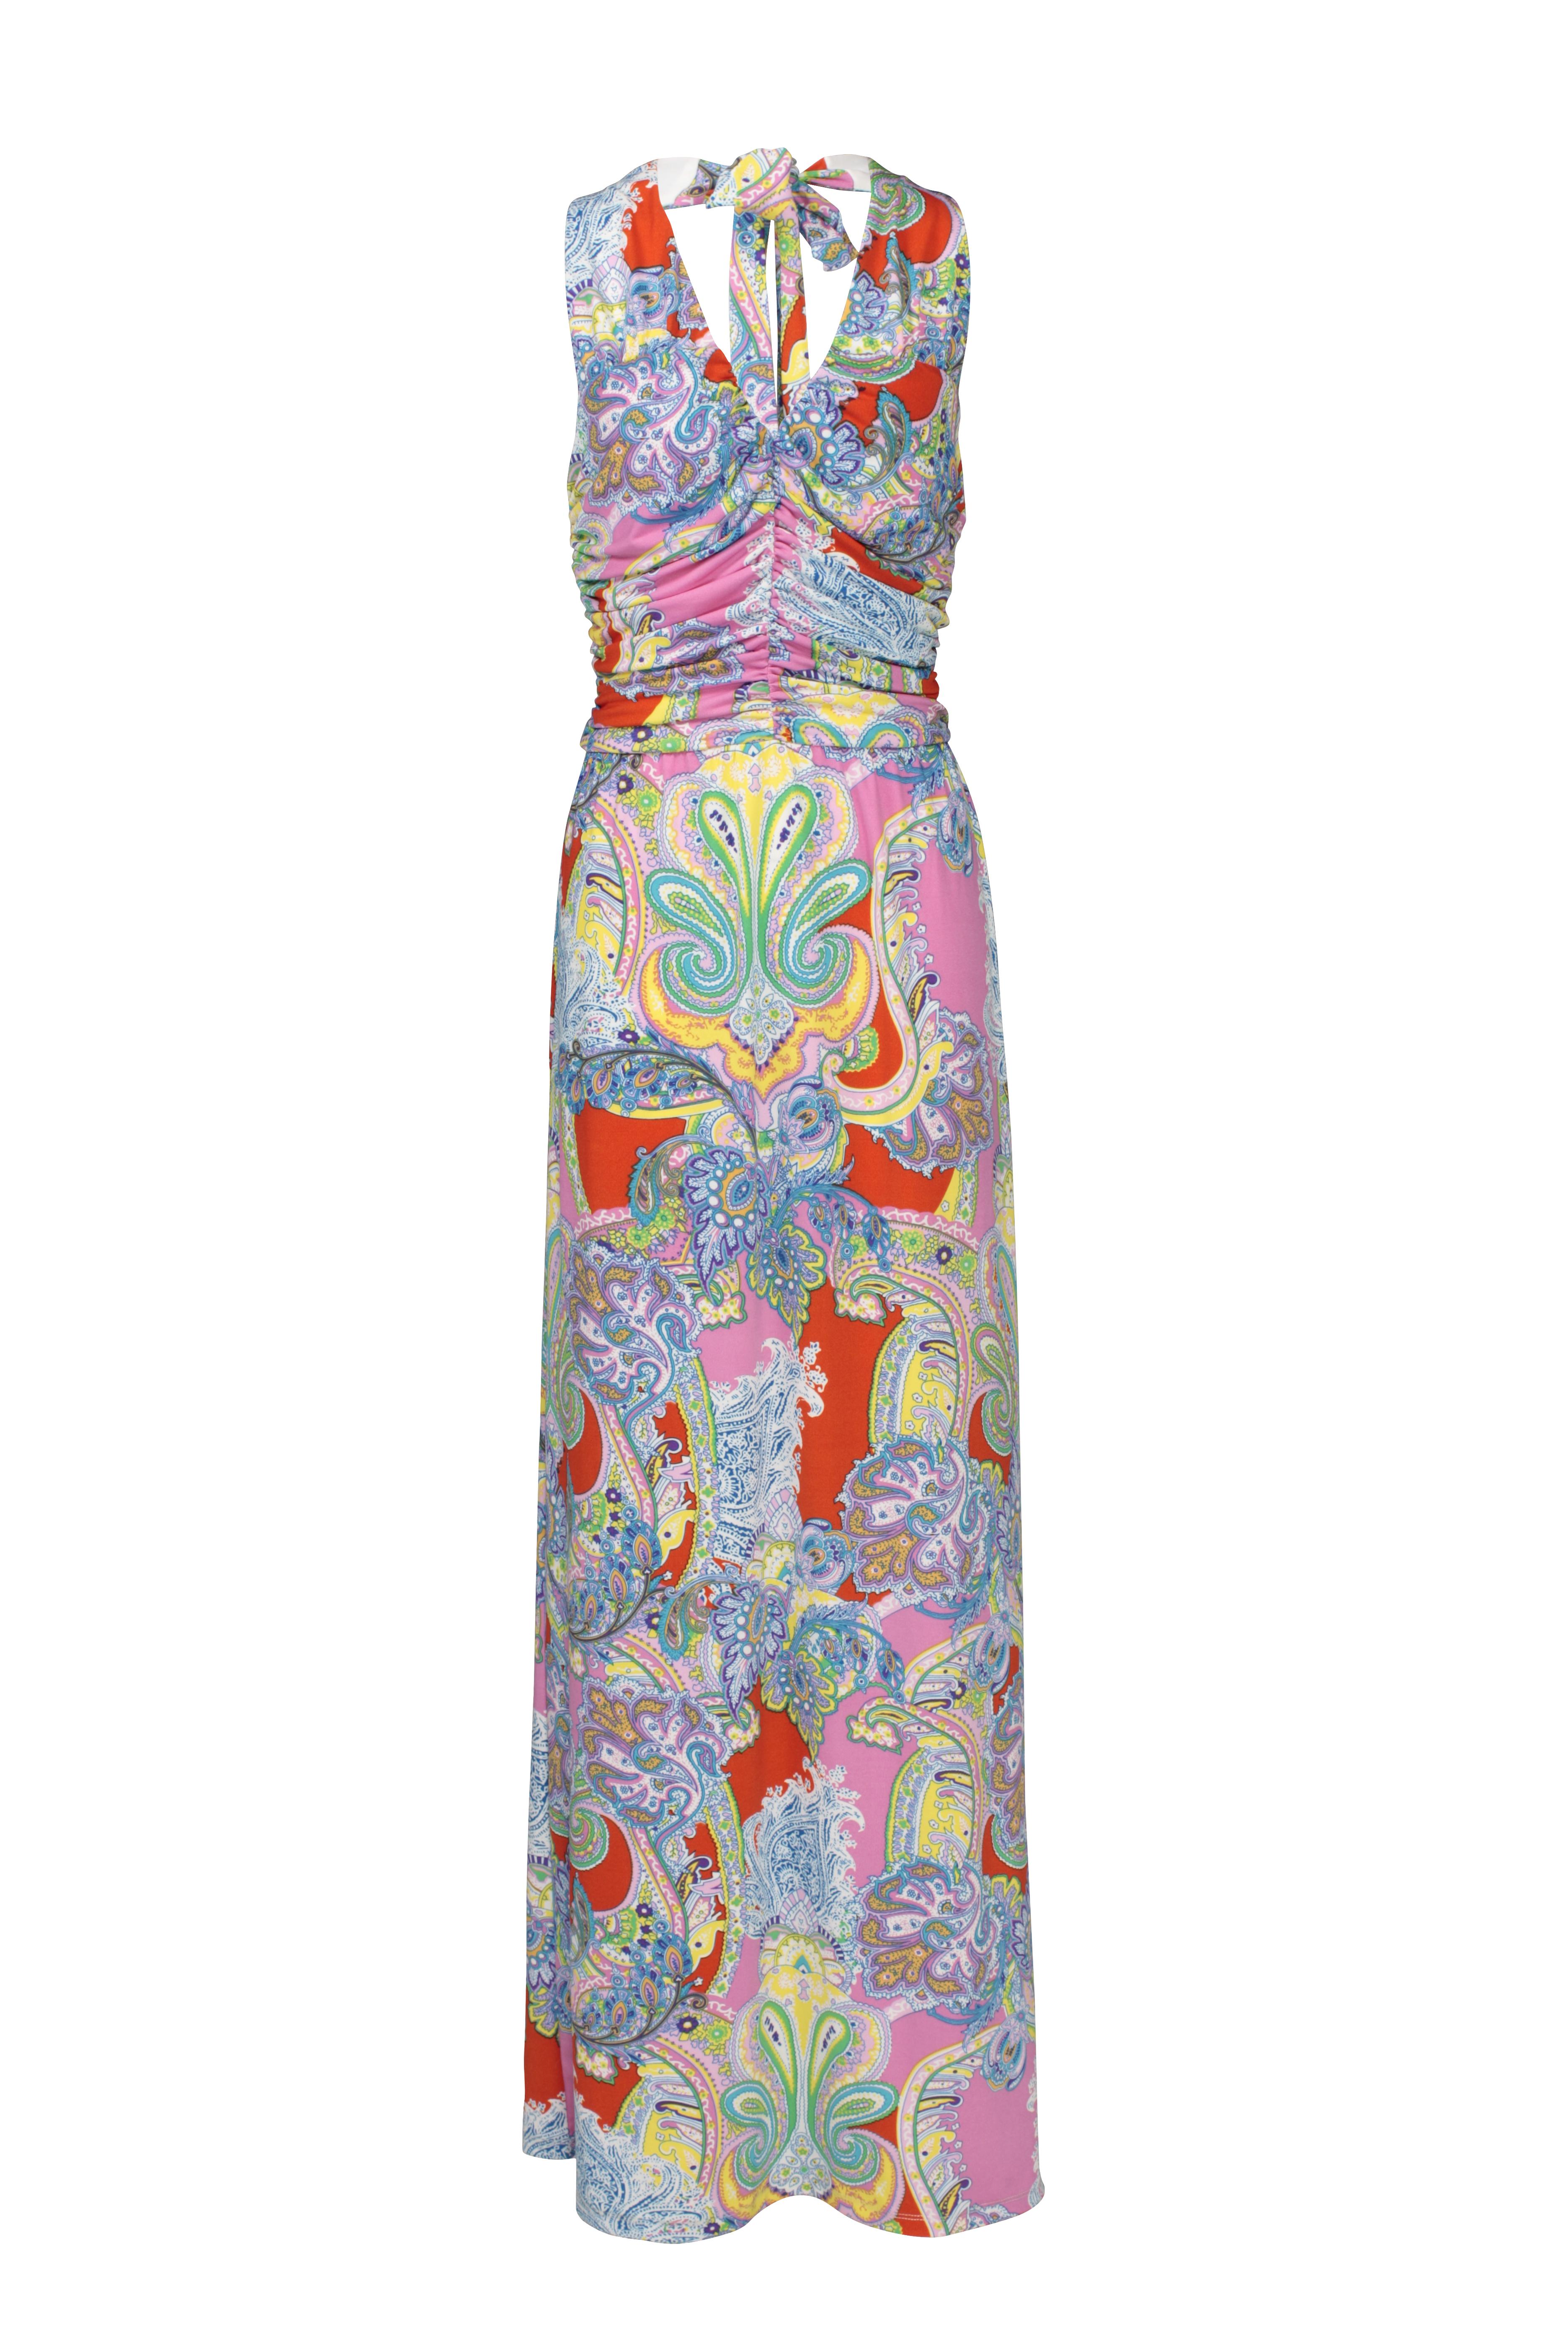 by Queenspark Print Lara Paisley Maxi Dress